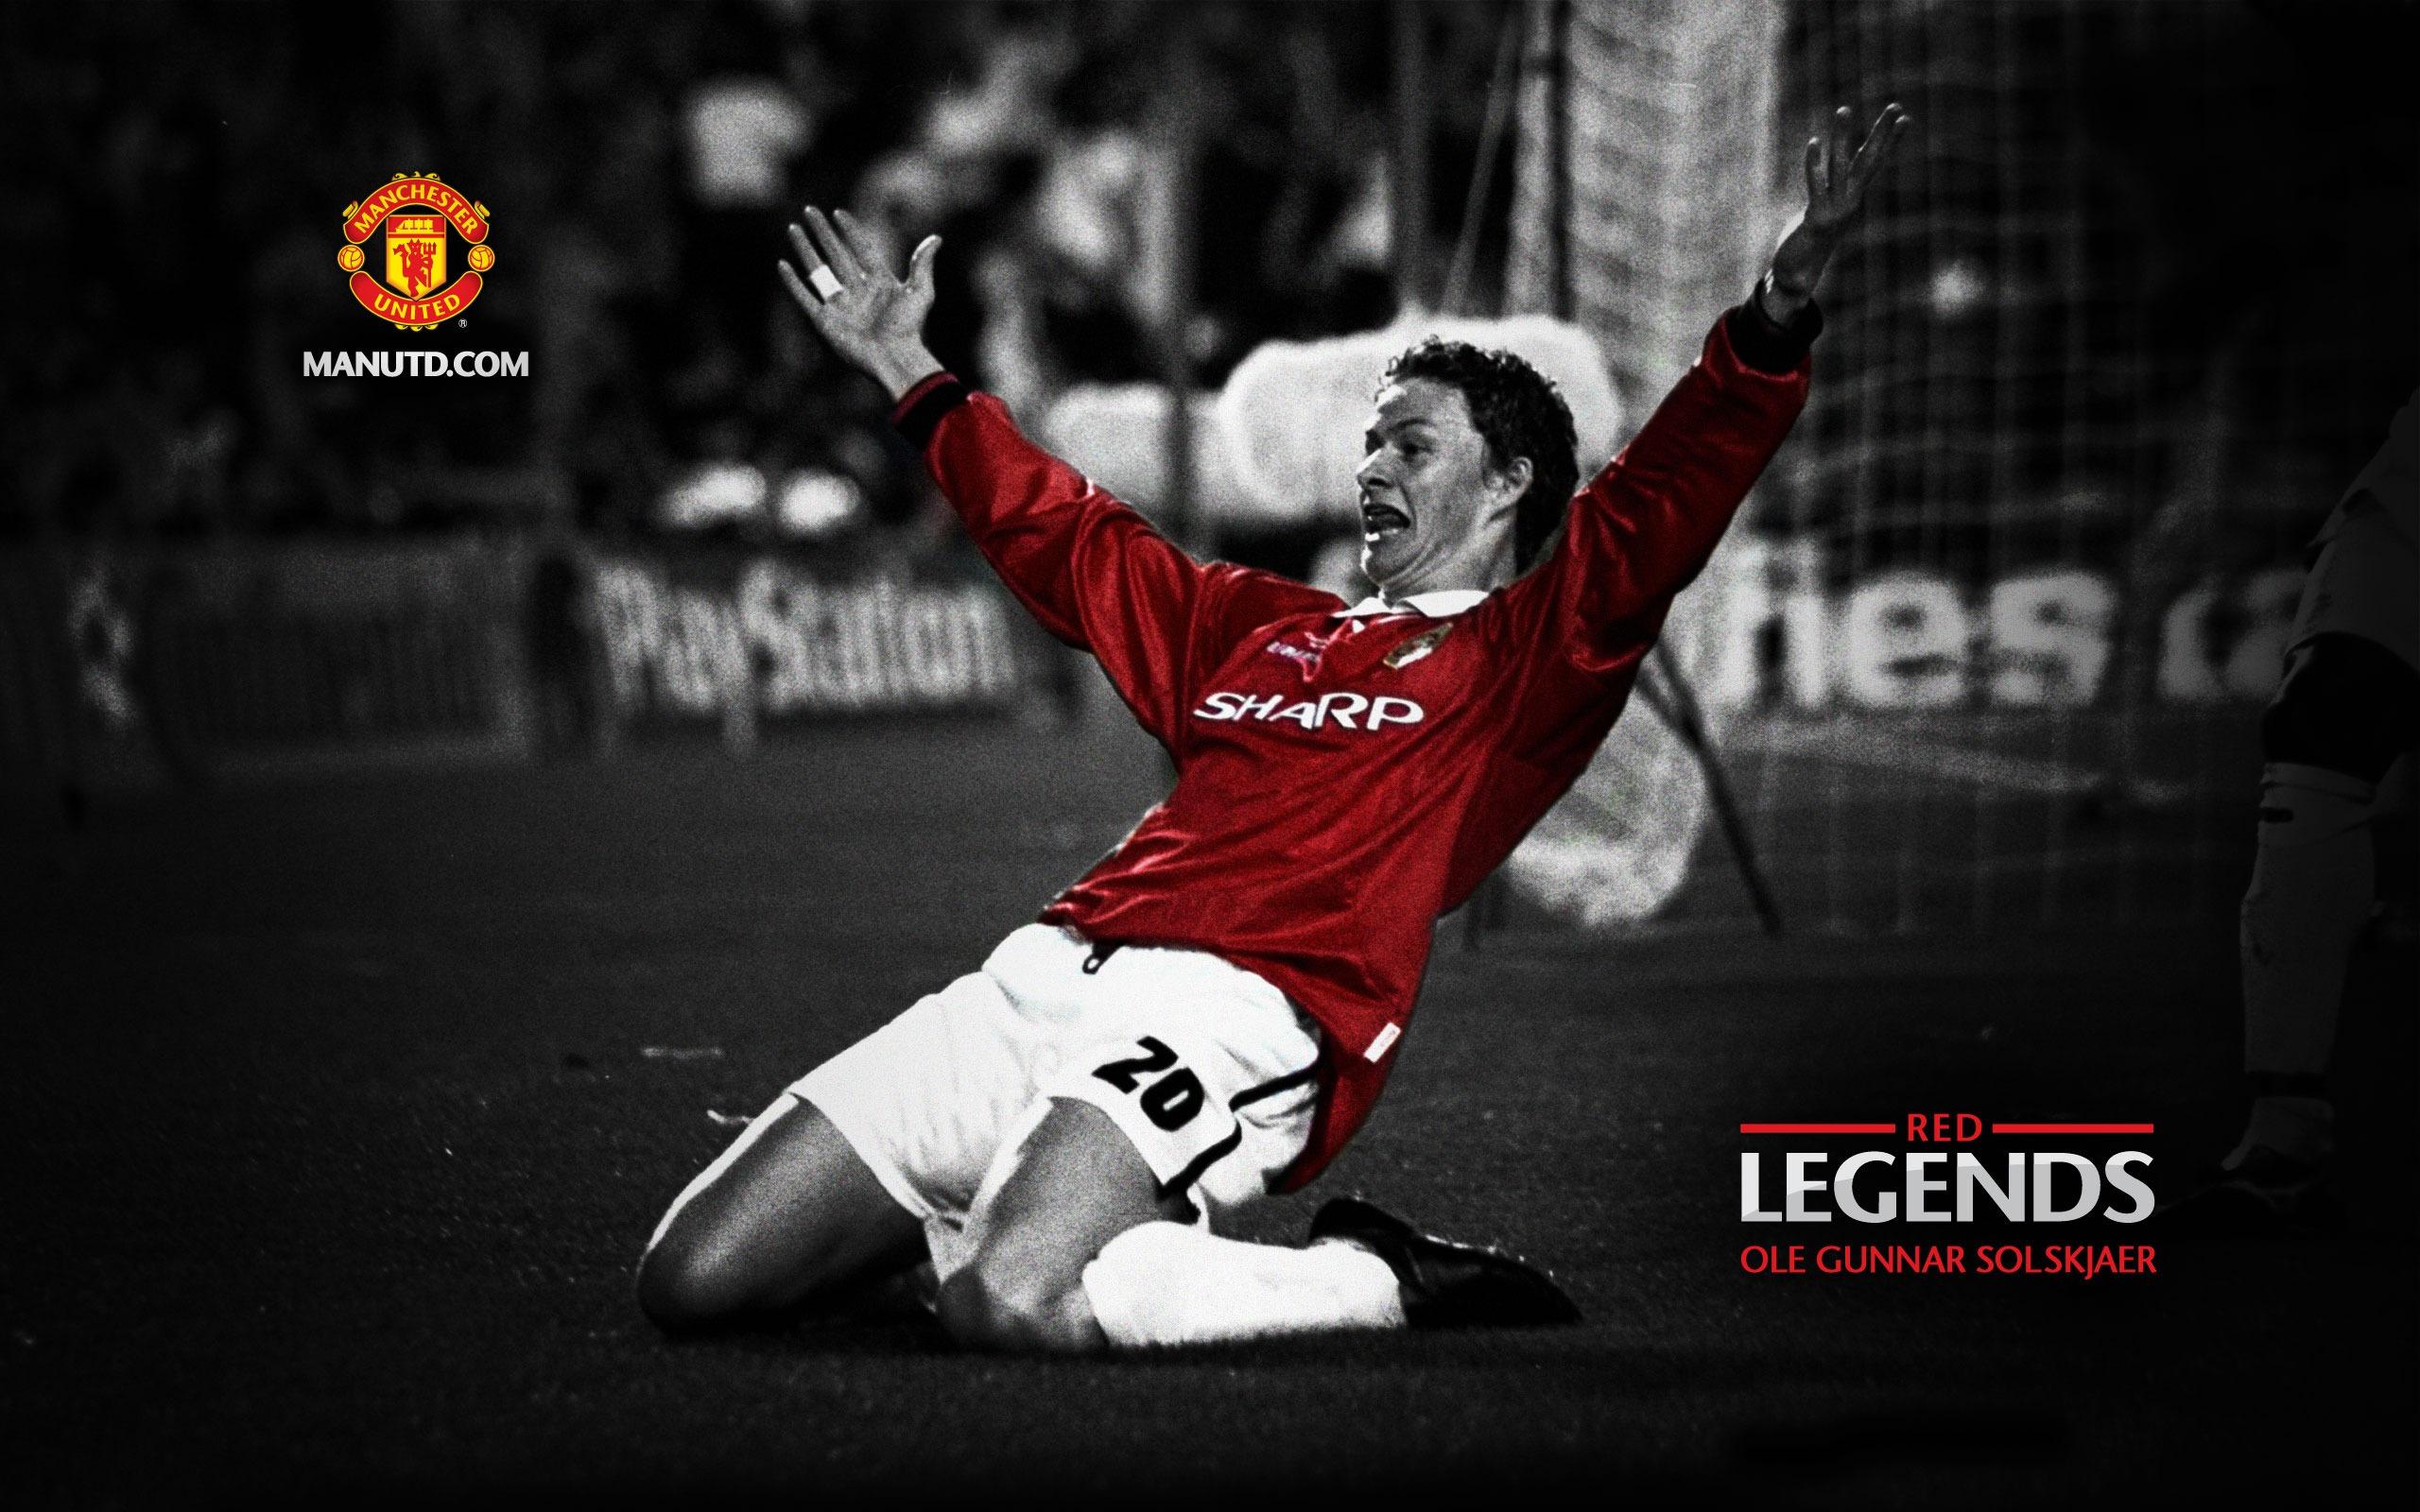 Ole Gunnar Solskjaer-Red Legends-Manchester United wallpaper Preview   10wallpaper.com